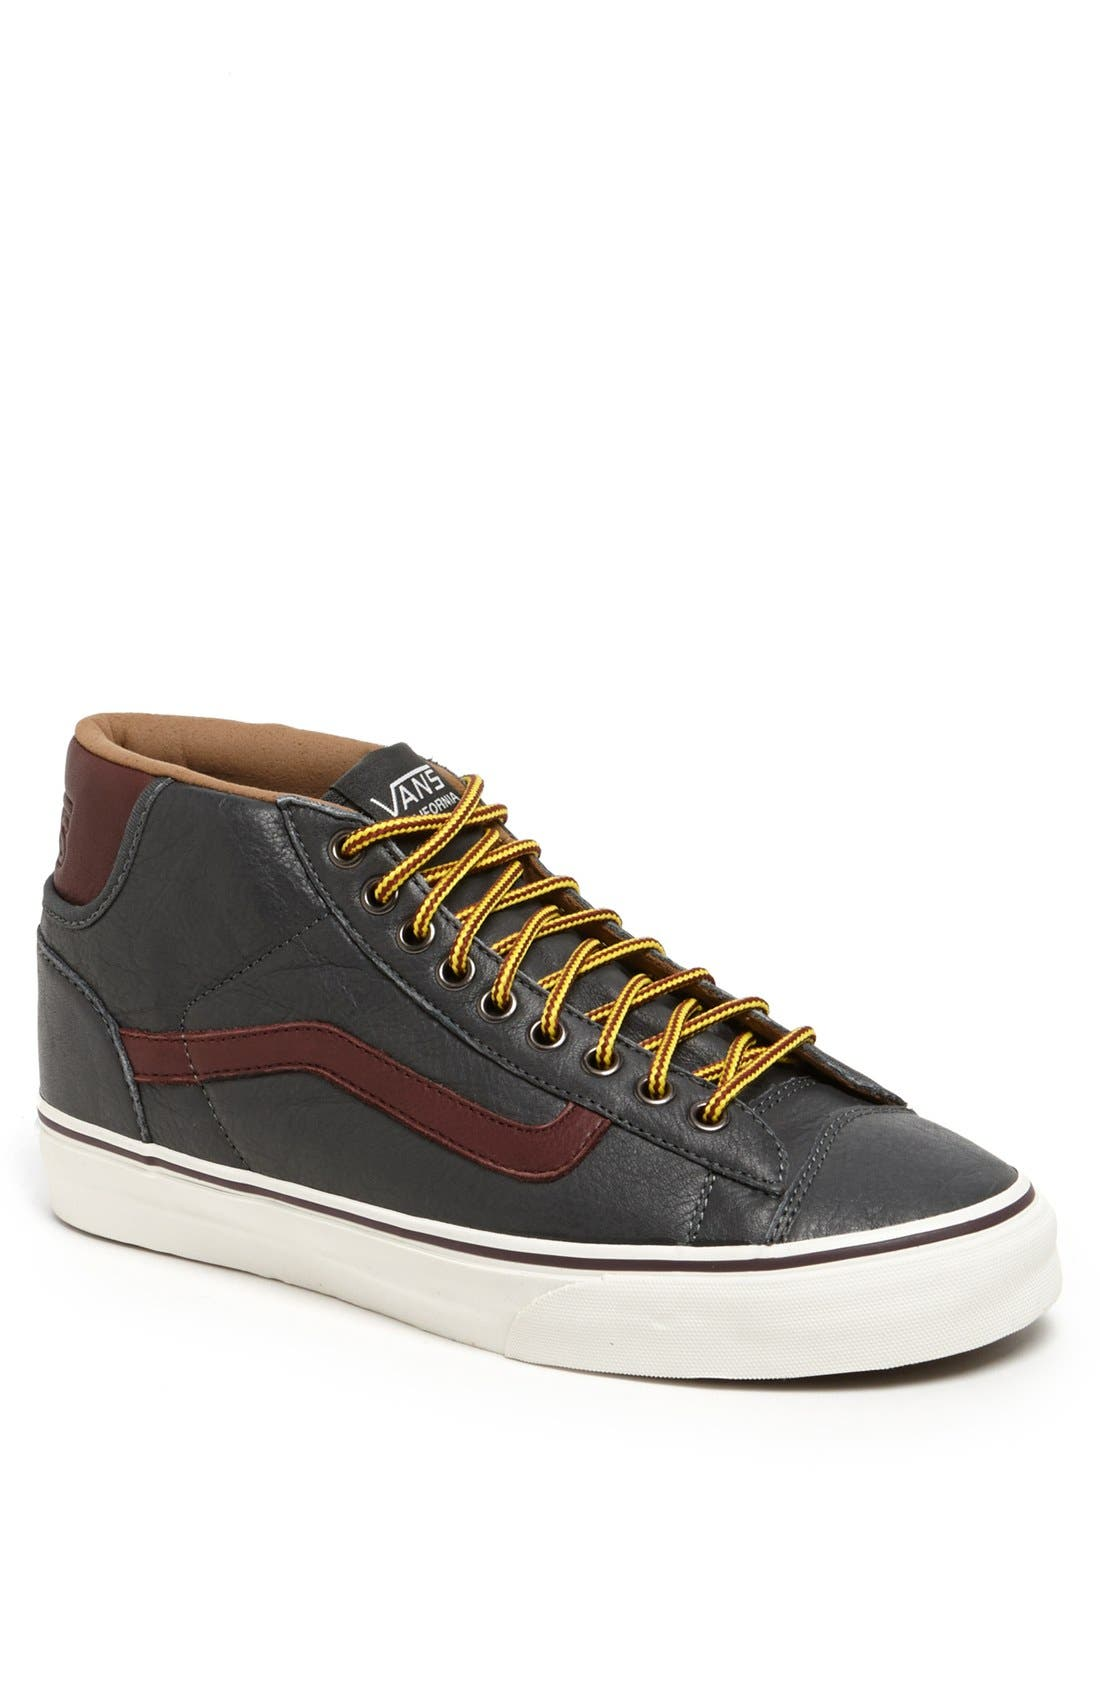 'Mid Skool 77' Sneaker,                             Main thumbnail 1, color,                             001